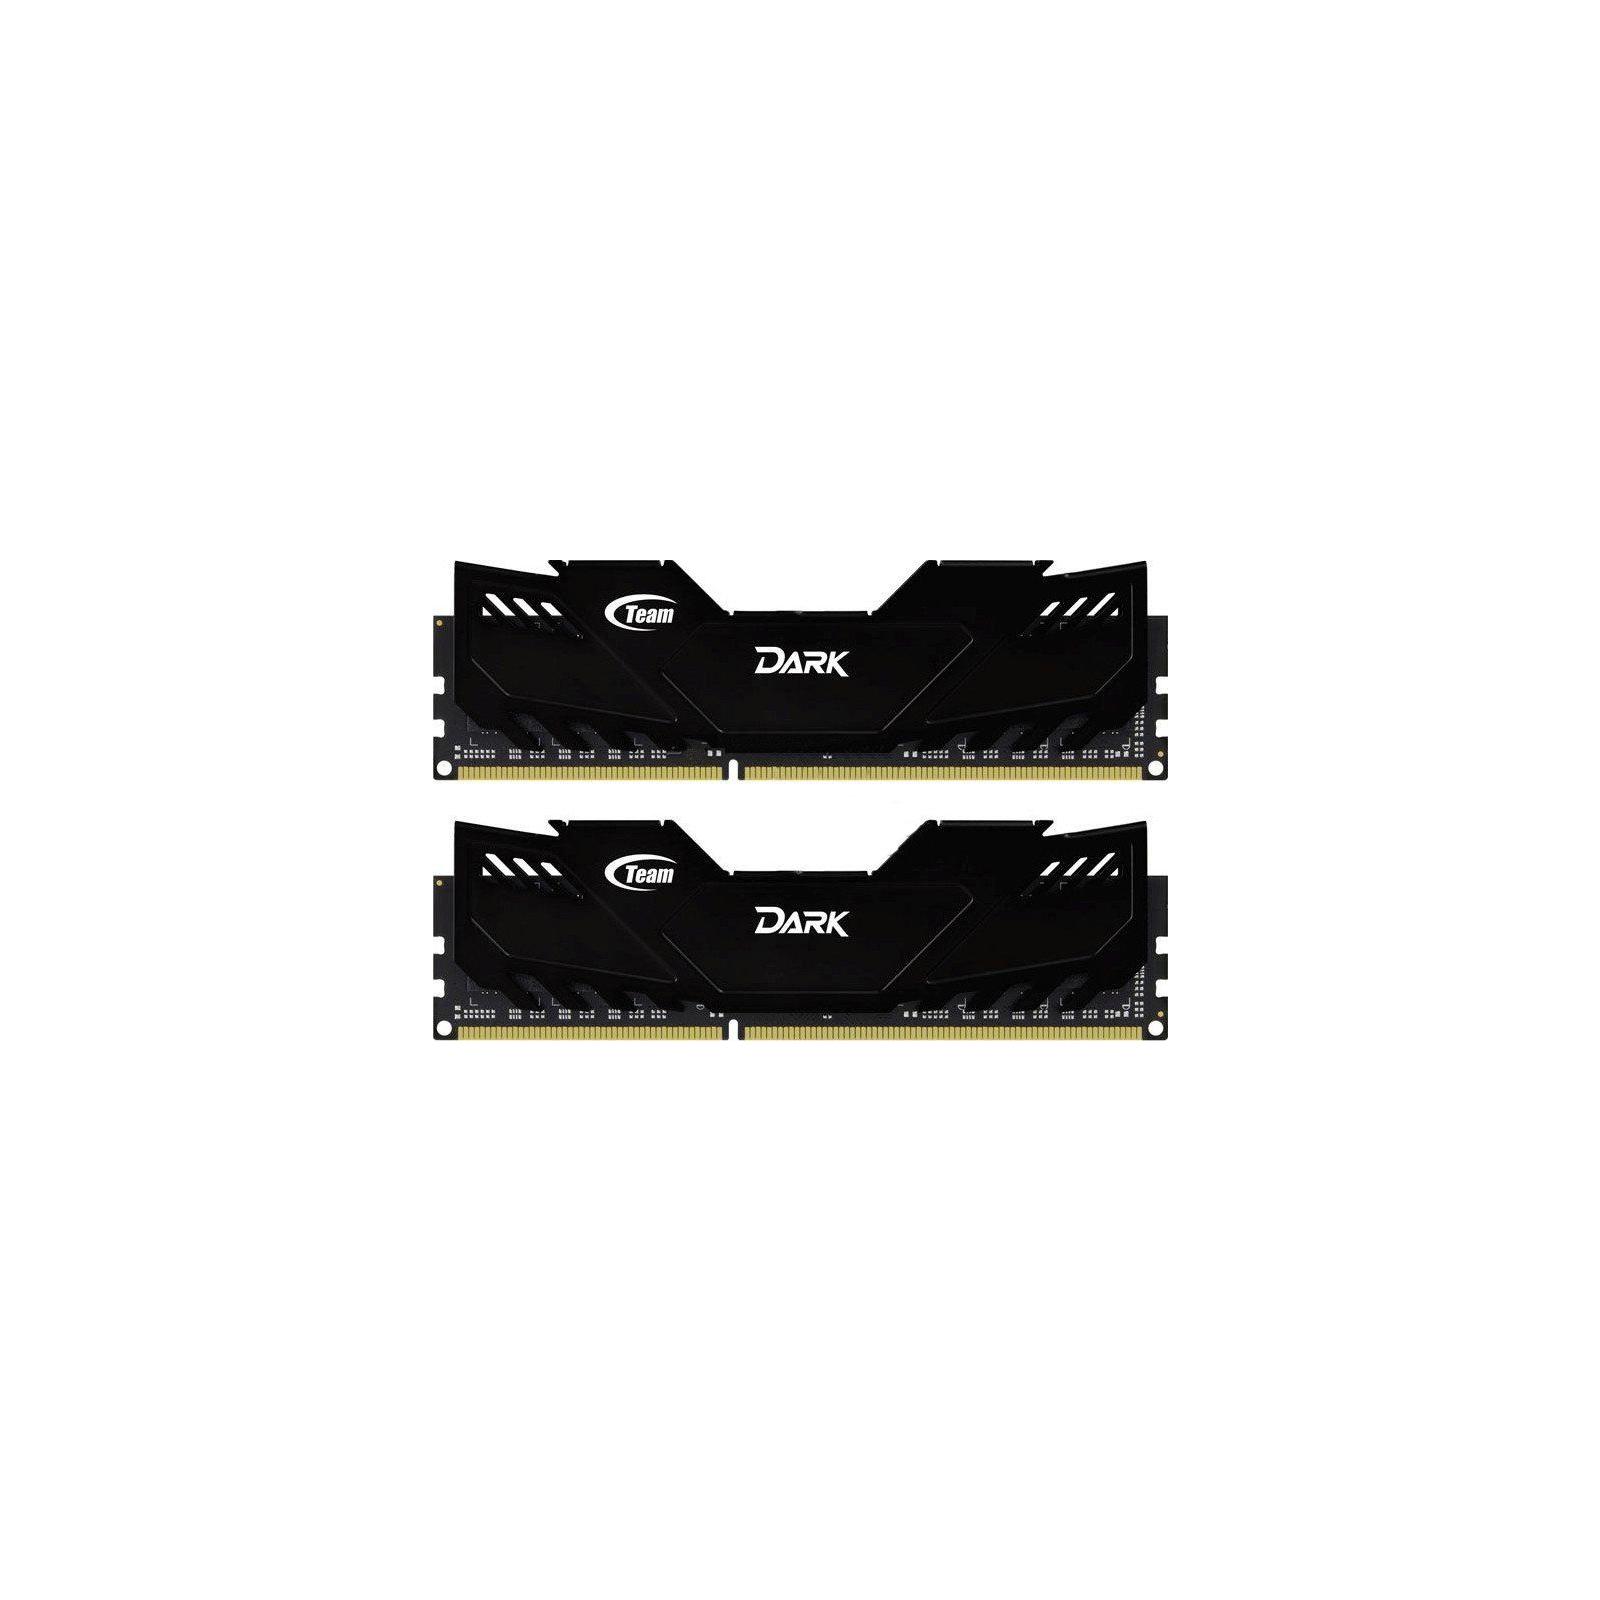 Модуль памяти для компьютера DDR4 8GB (2x4GB) 3000 MHz Dark Black Team (TDKED48G3000HC16ADC01)